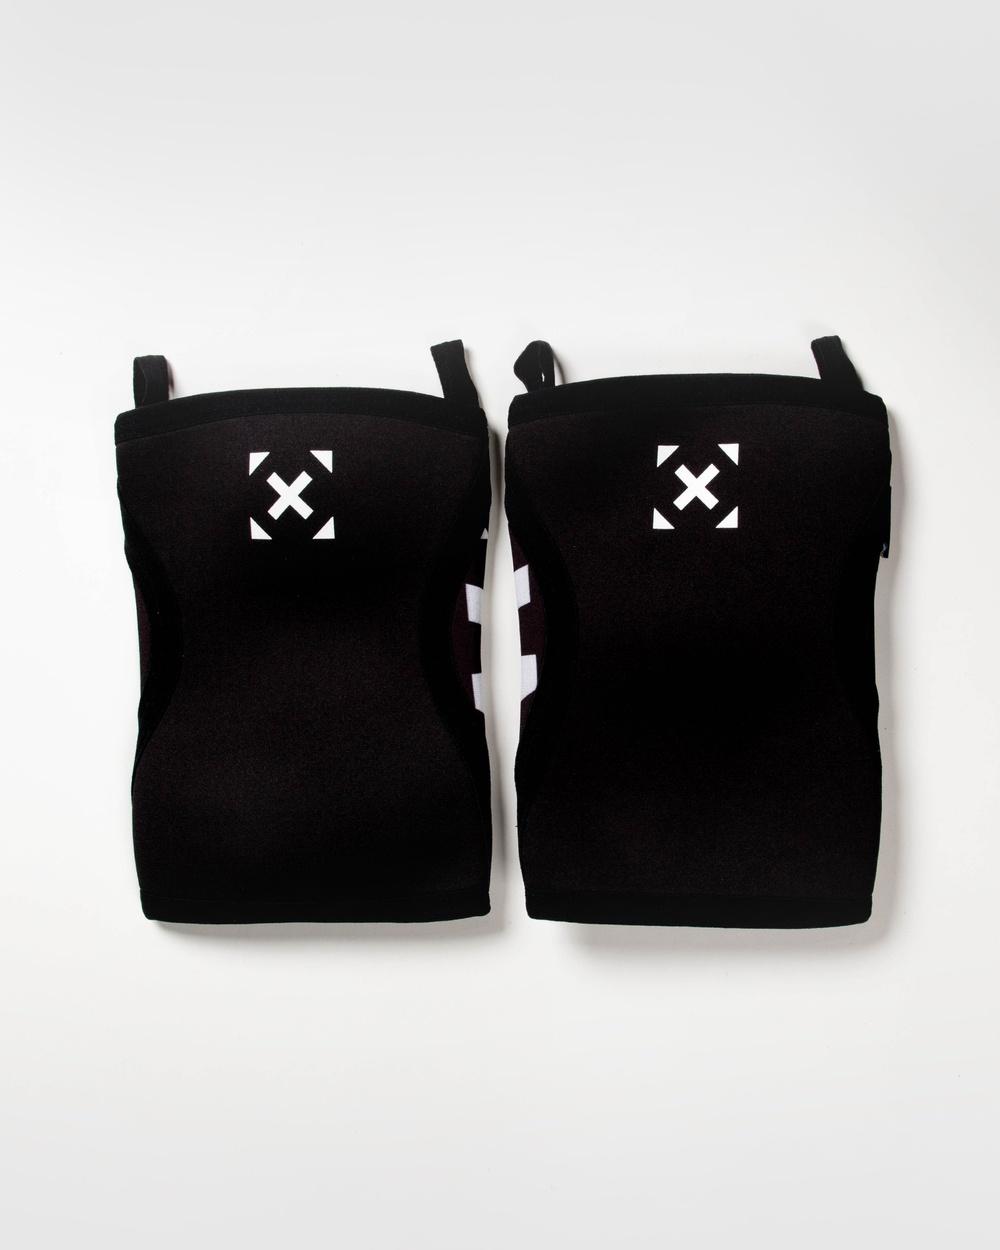 The WOD Life Everyday Knee Sleeves 7mm Gym & Yoga Black